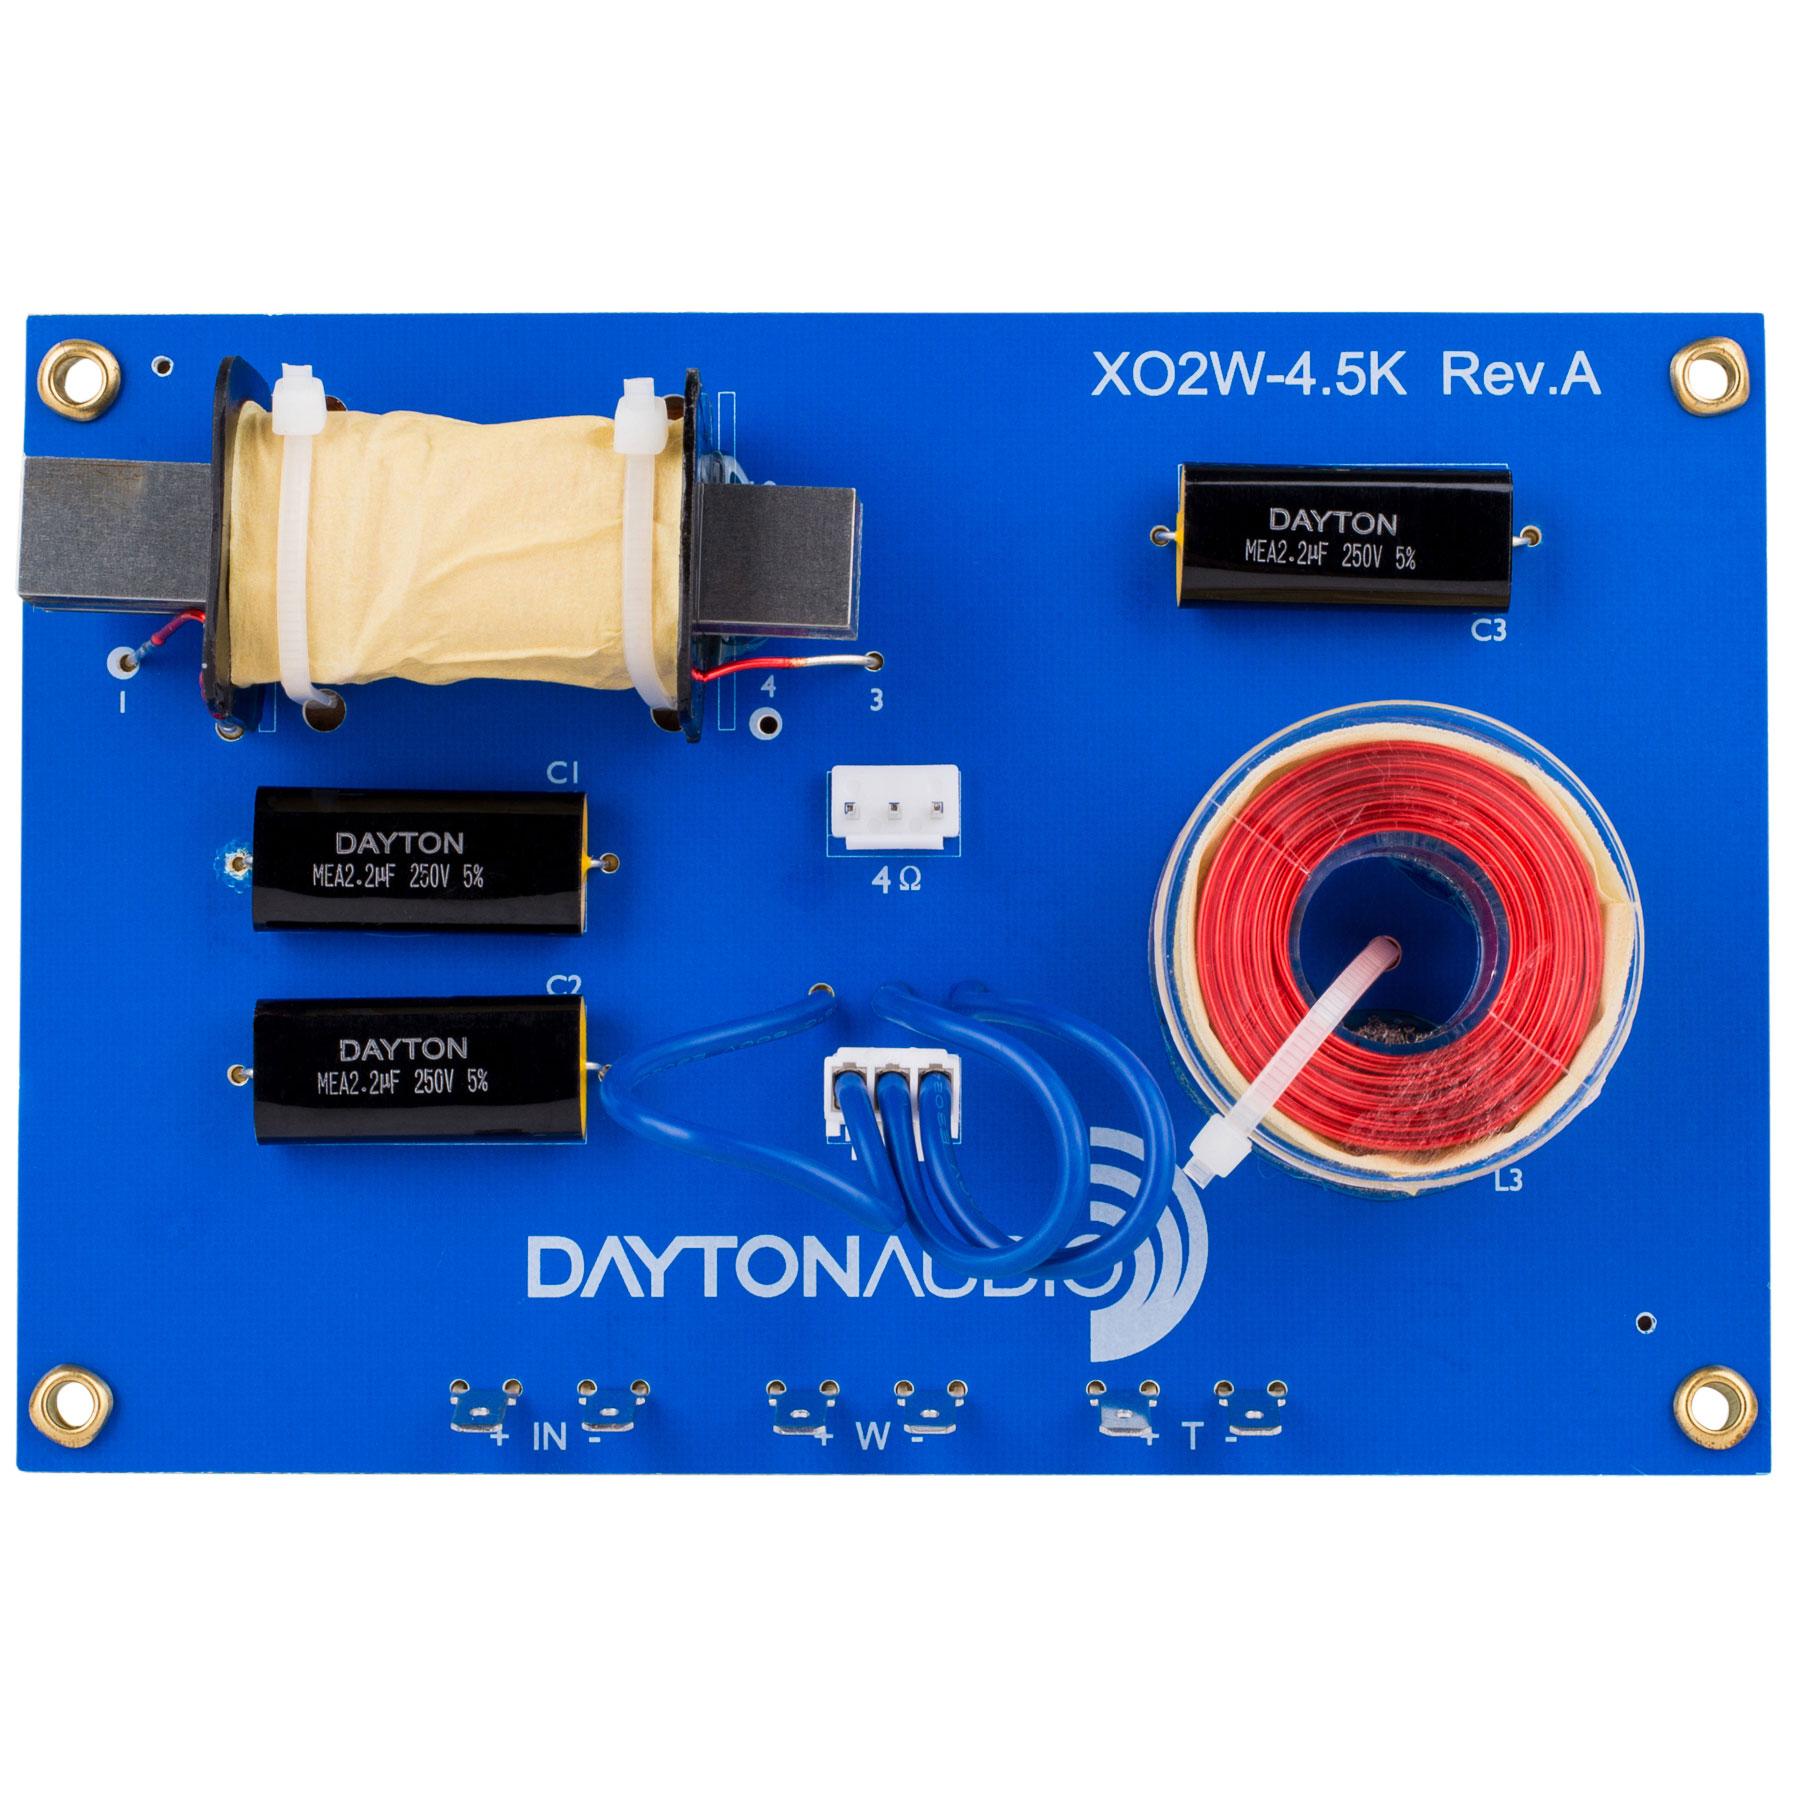 Dayton Audio XO2W-4.5K画像